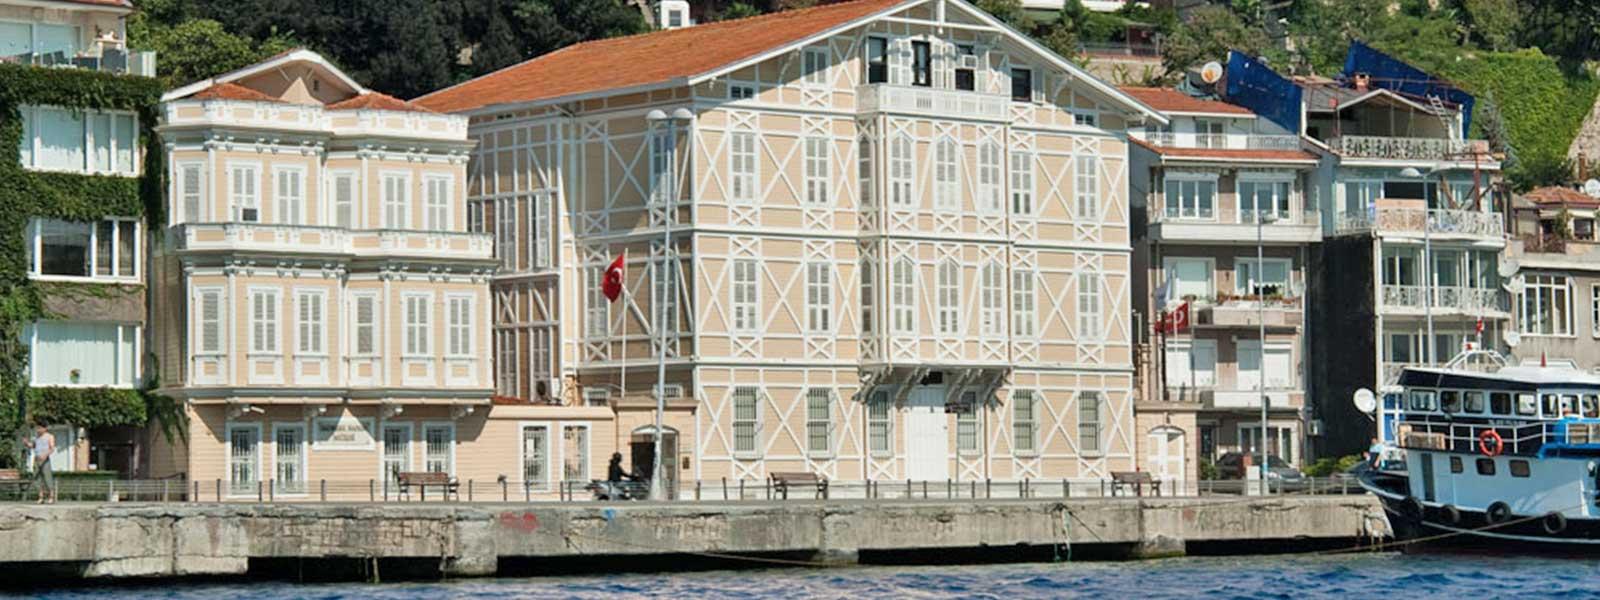 Sadberk Hanim Museum Istanbul